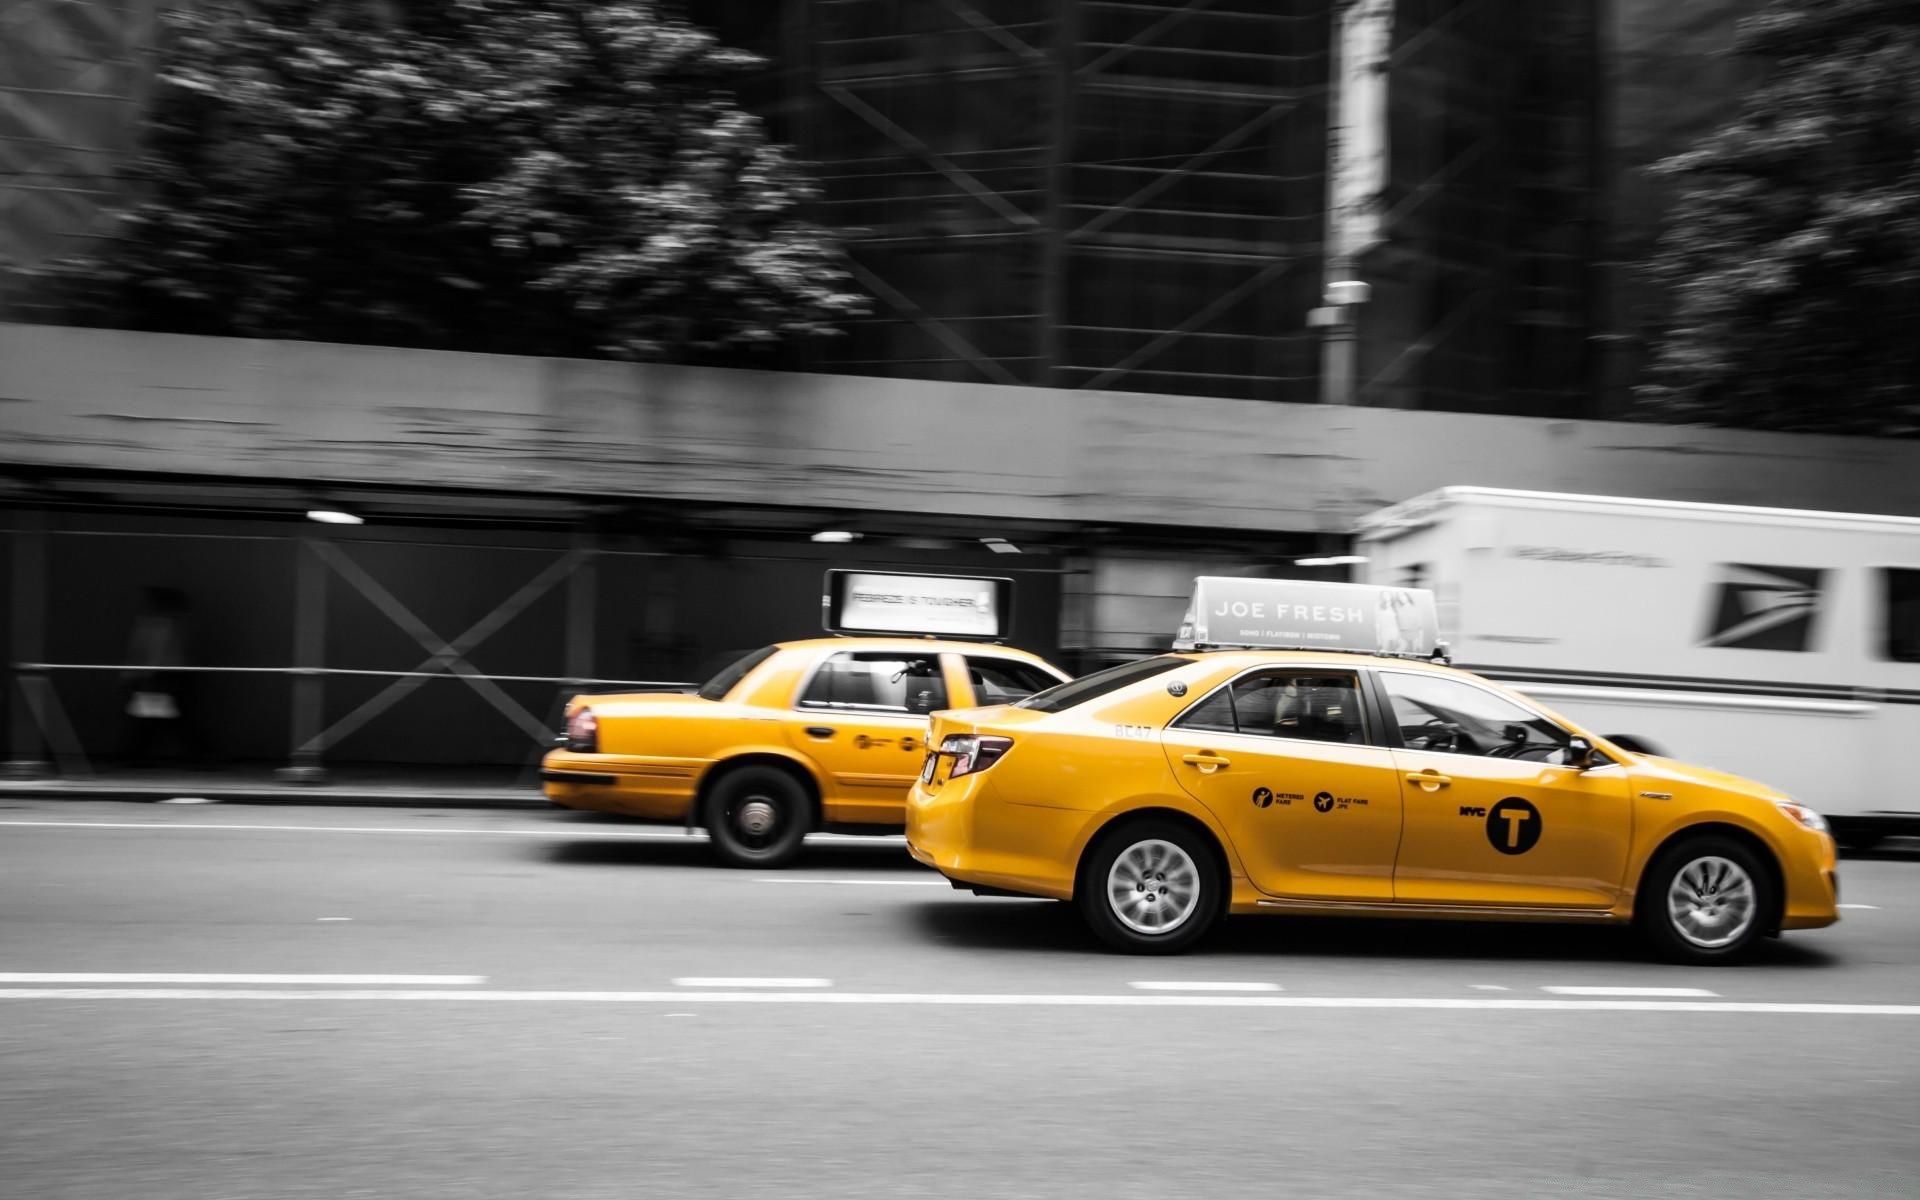 Обои на рабочий стол такси 4